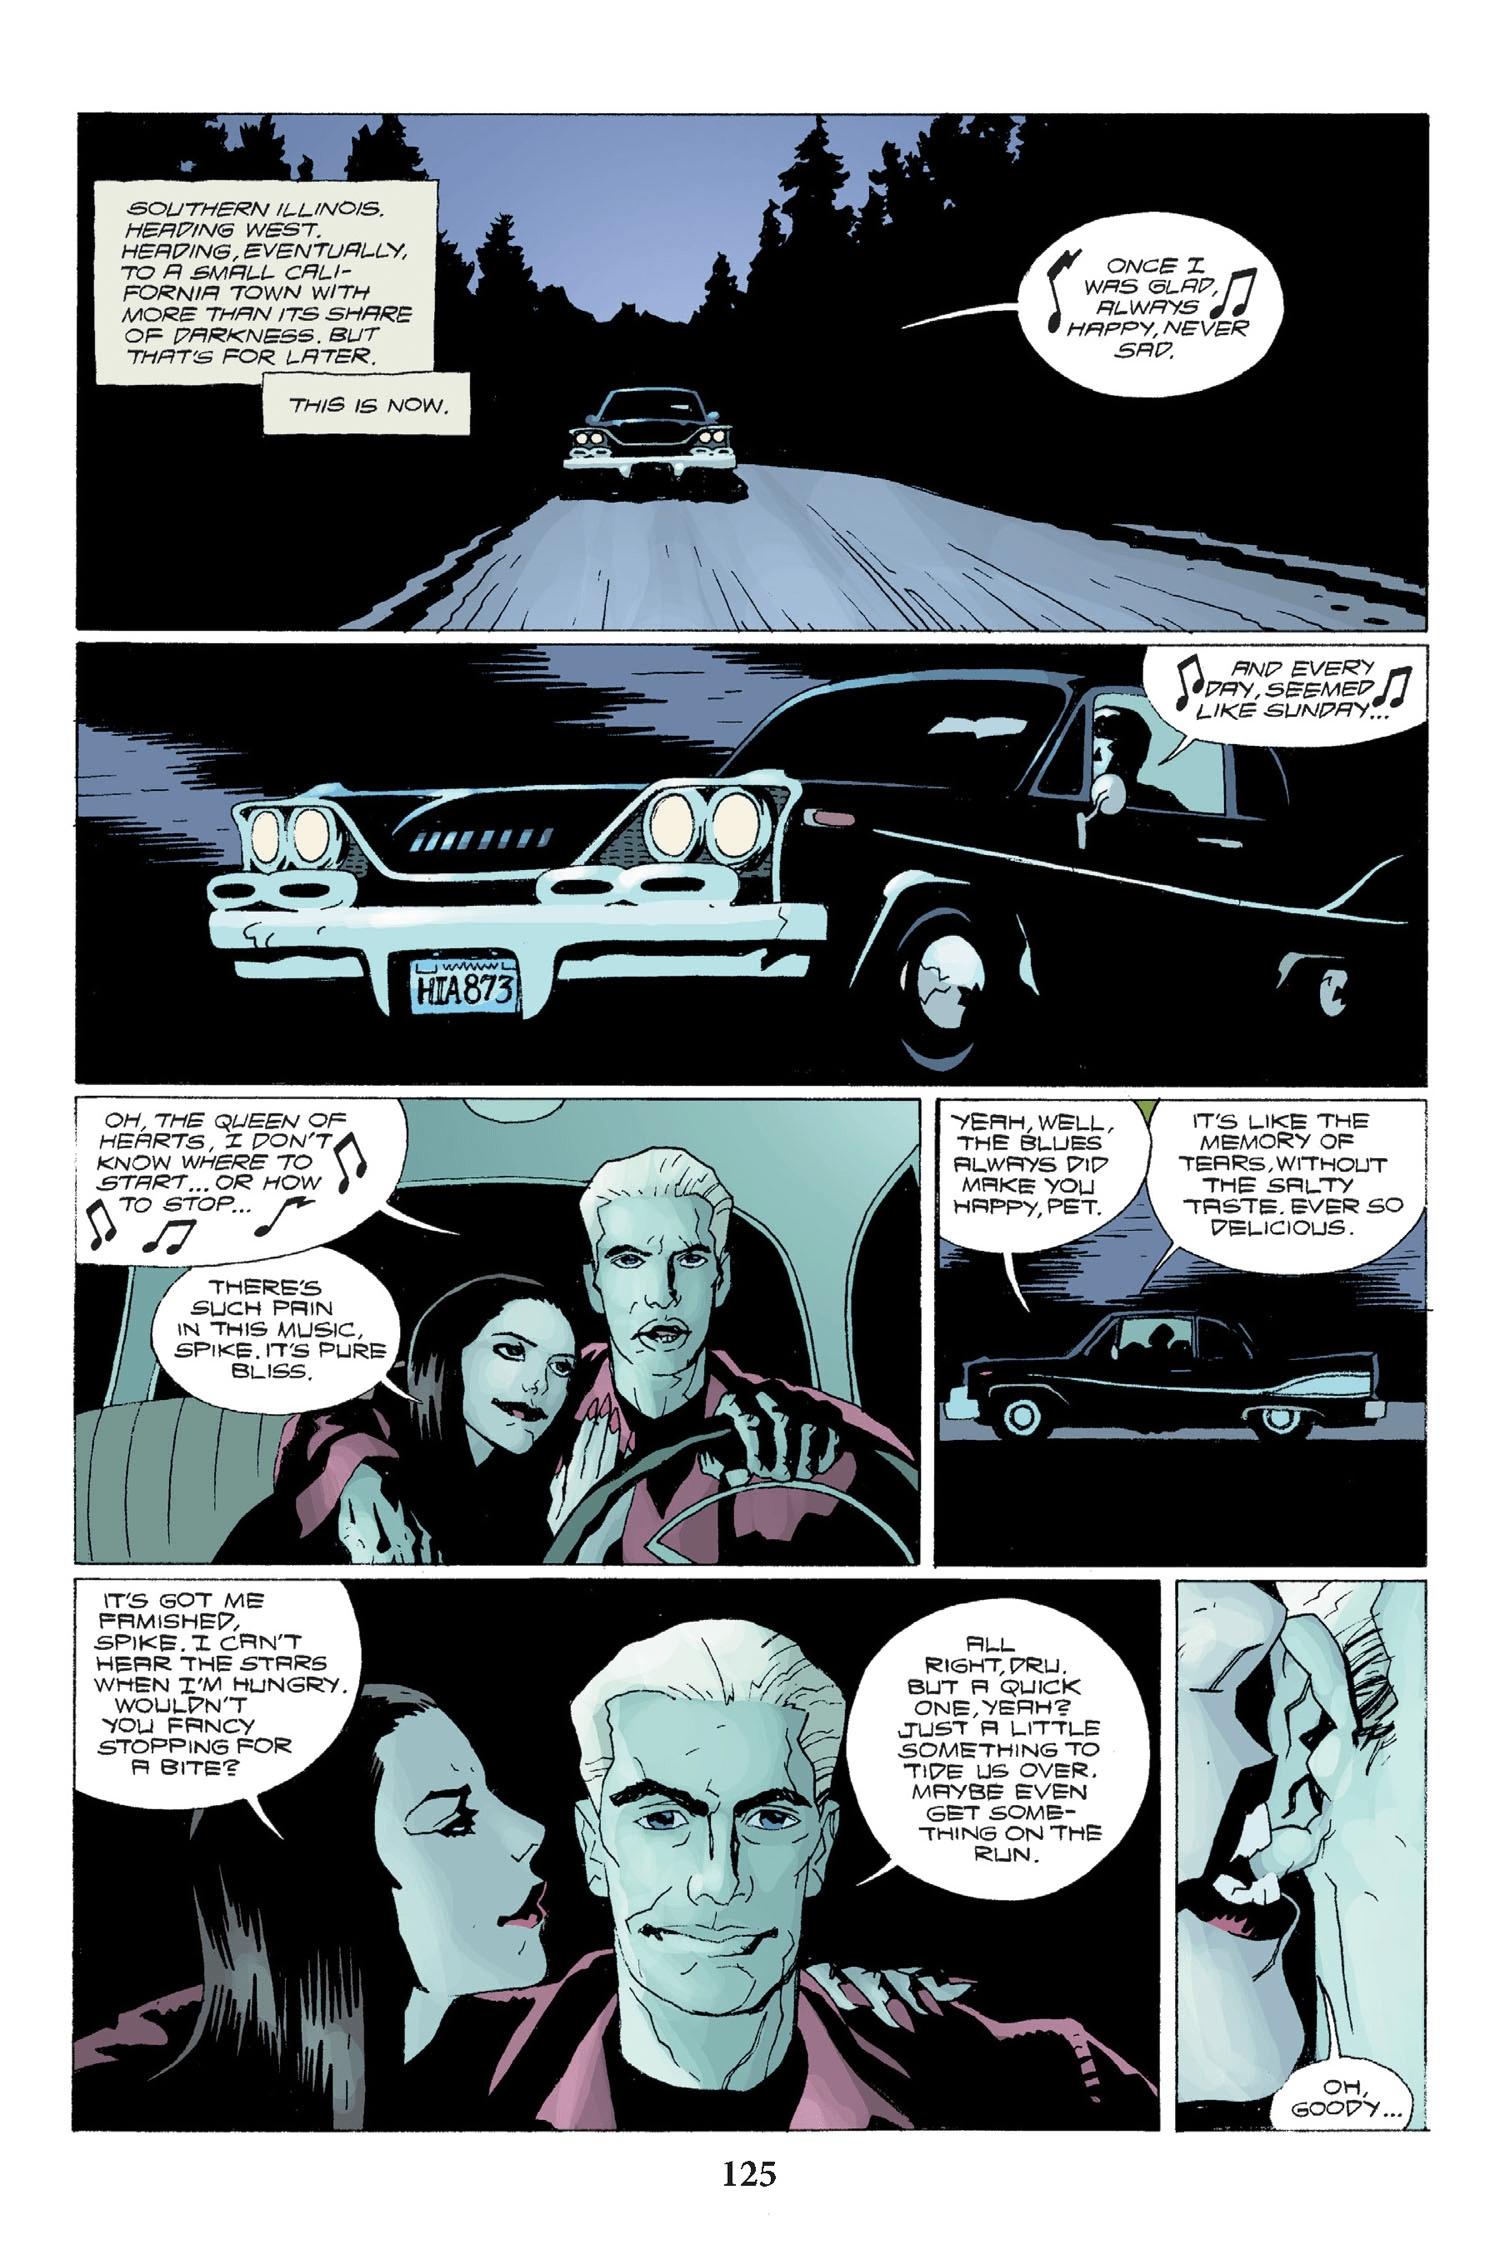 Read online Buffy the Vampire Slayer: Omnibus comic -  Issue # TPB 2 - 119